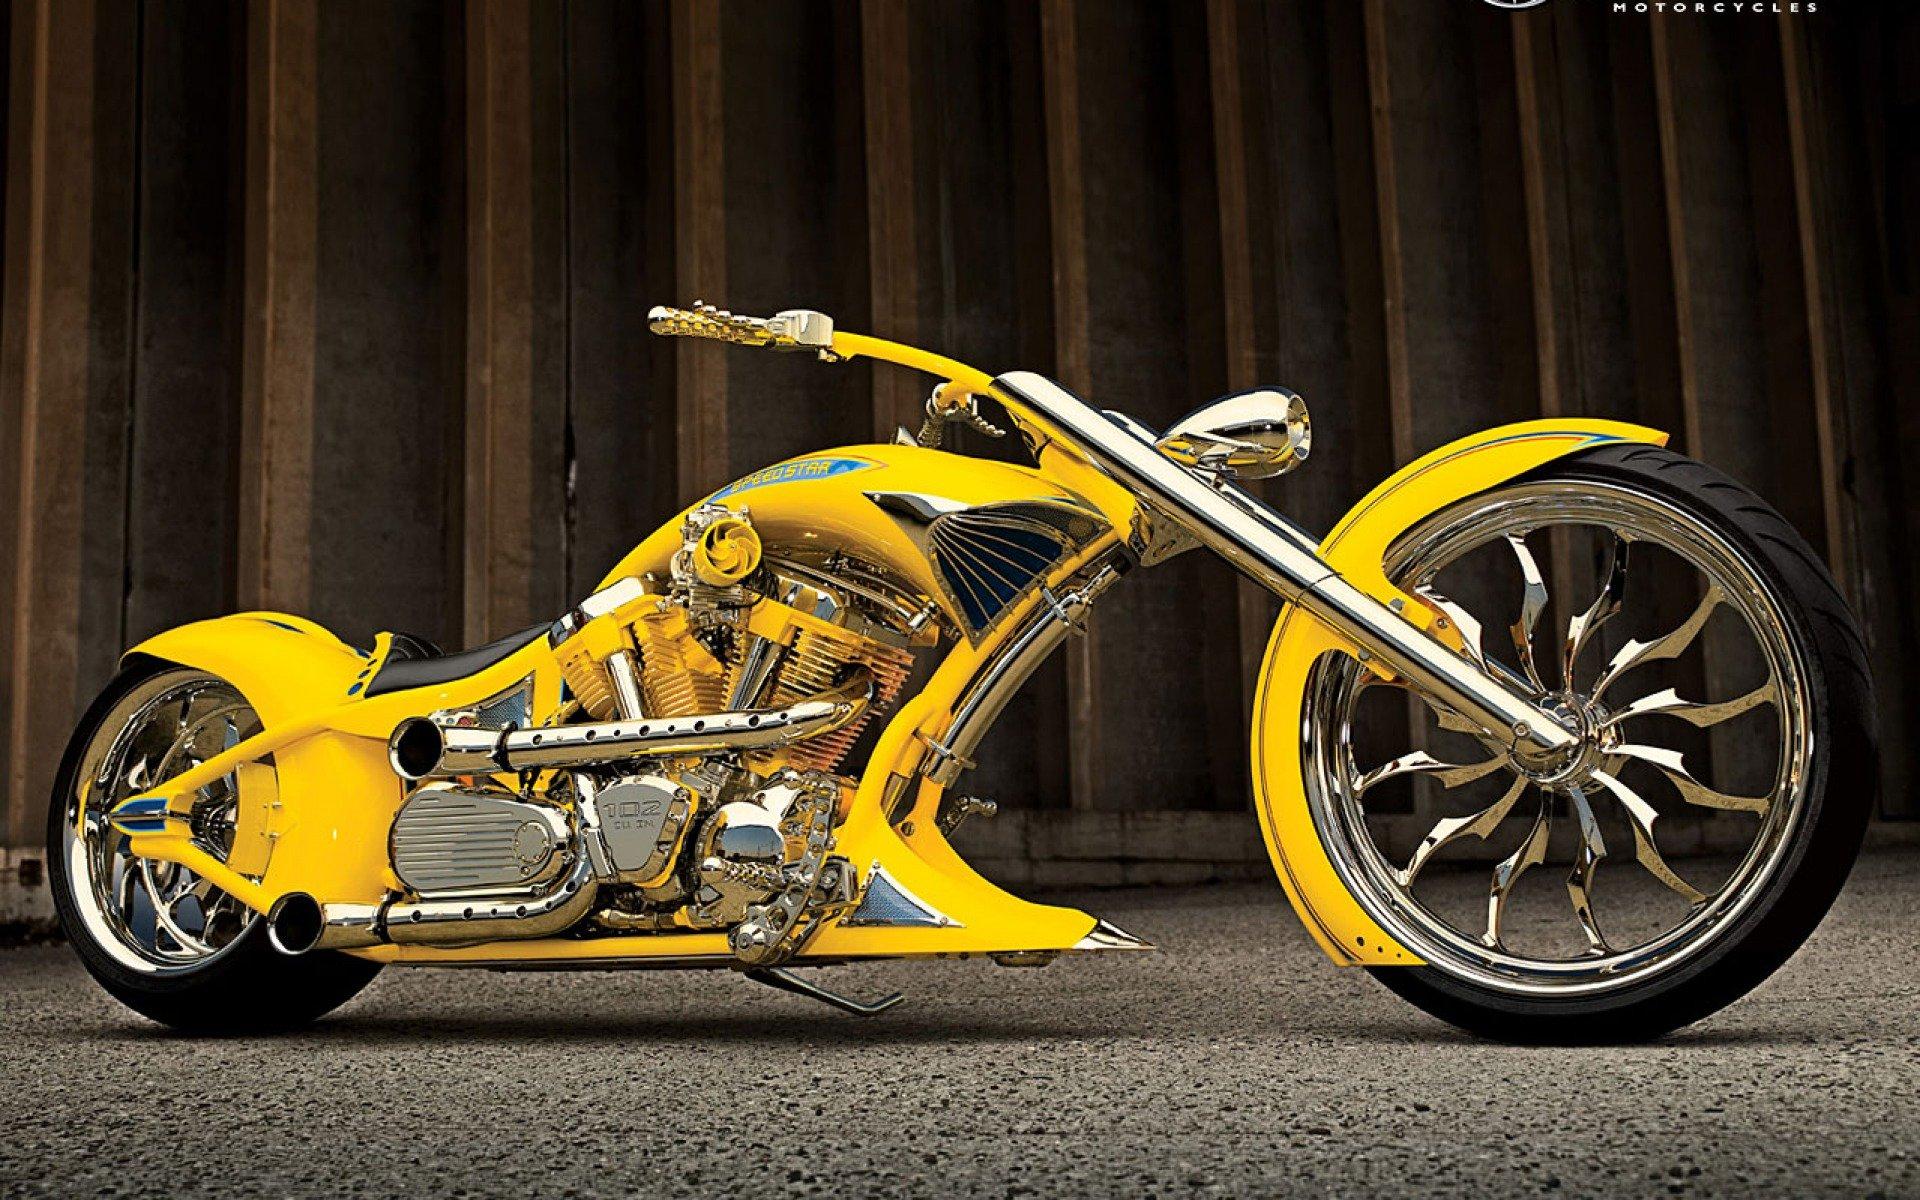 ORANGE COUNTY CHOPPERS occ custom chopper hot rod rods bike motorbike 1920x1200